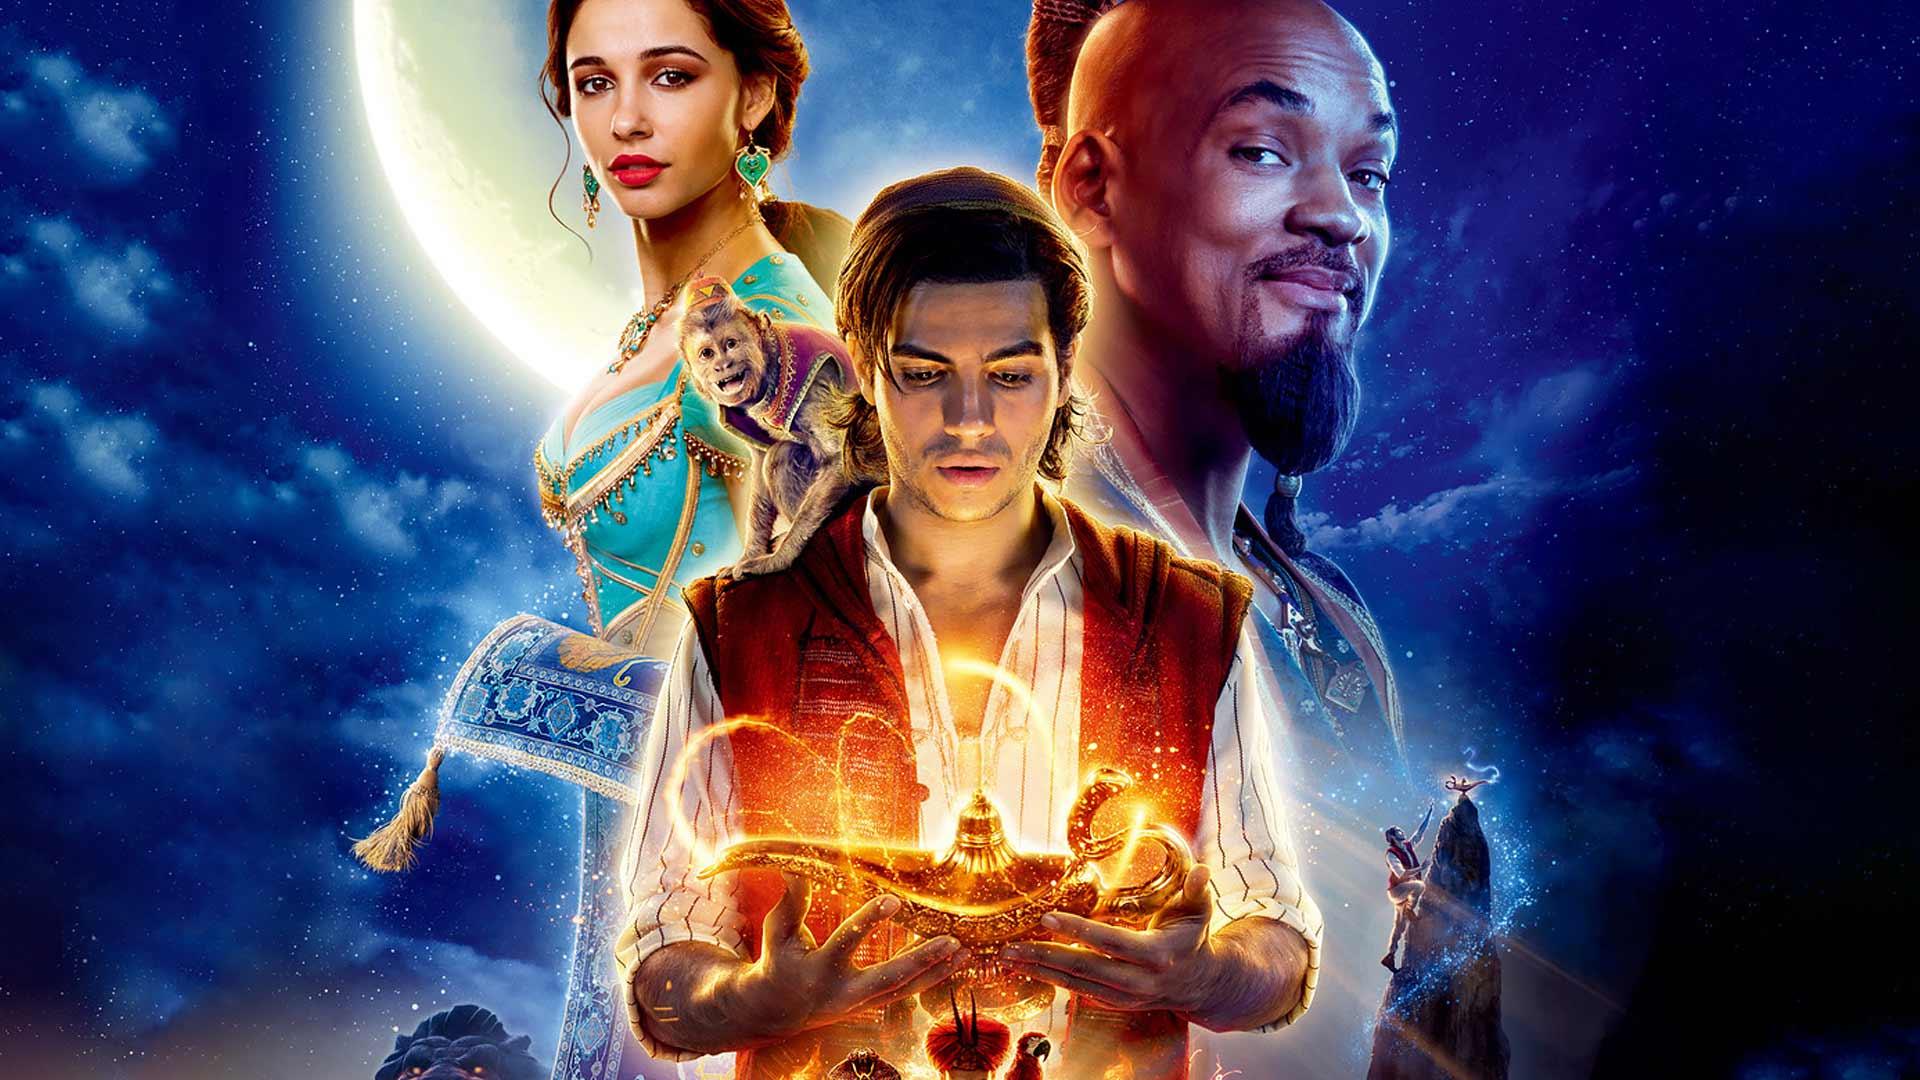 Aladdin 2019 After The Credits Mediastinger